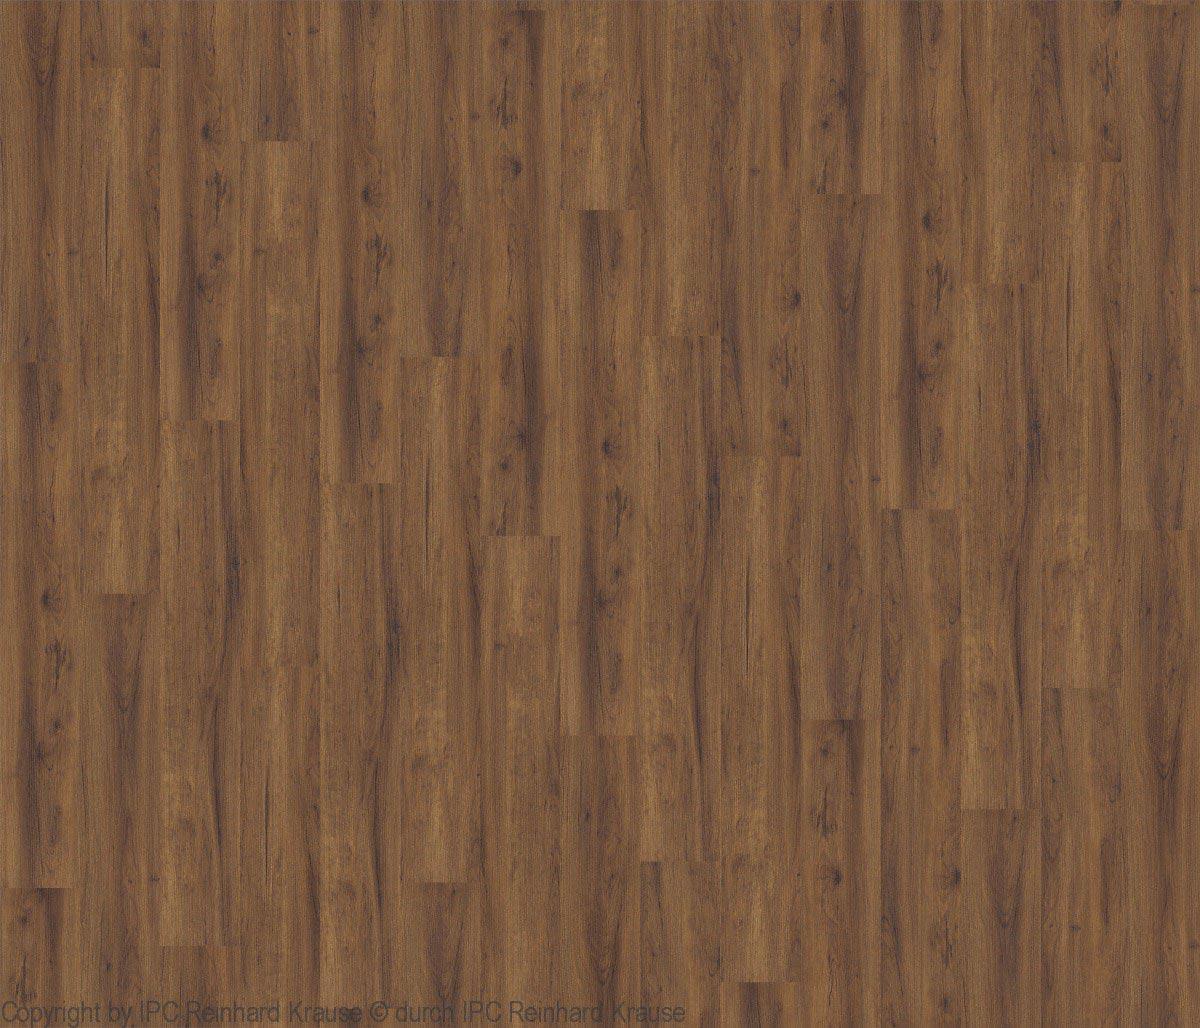 vinyl designboden elegance mara nussbaum rustikal. Black Bedroom Furniture Sets. Home Design Ideas